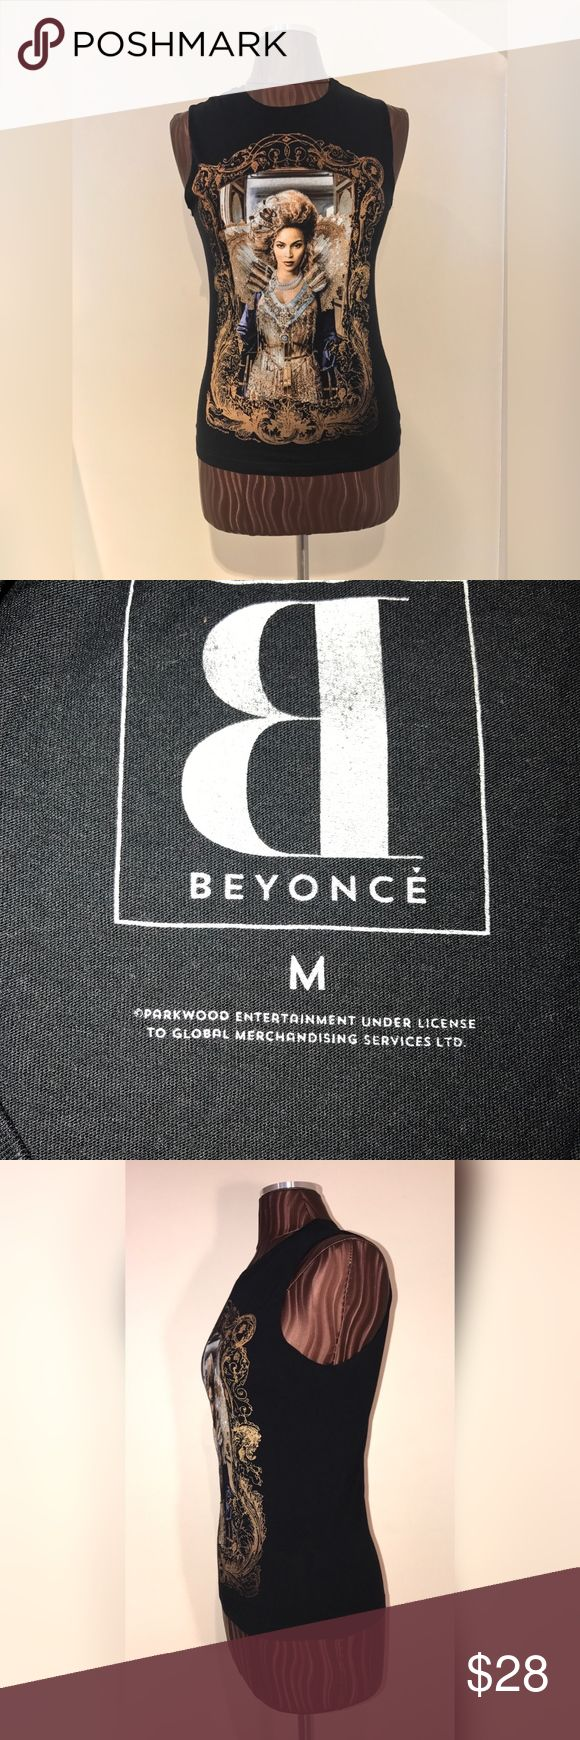 Mrs. Carter World Tour Beyonce Tank New/ Never worn Beyonce Tank from the Mrs. Carter World Tour.  Size Medium. Beyonce Tops Tank Tops